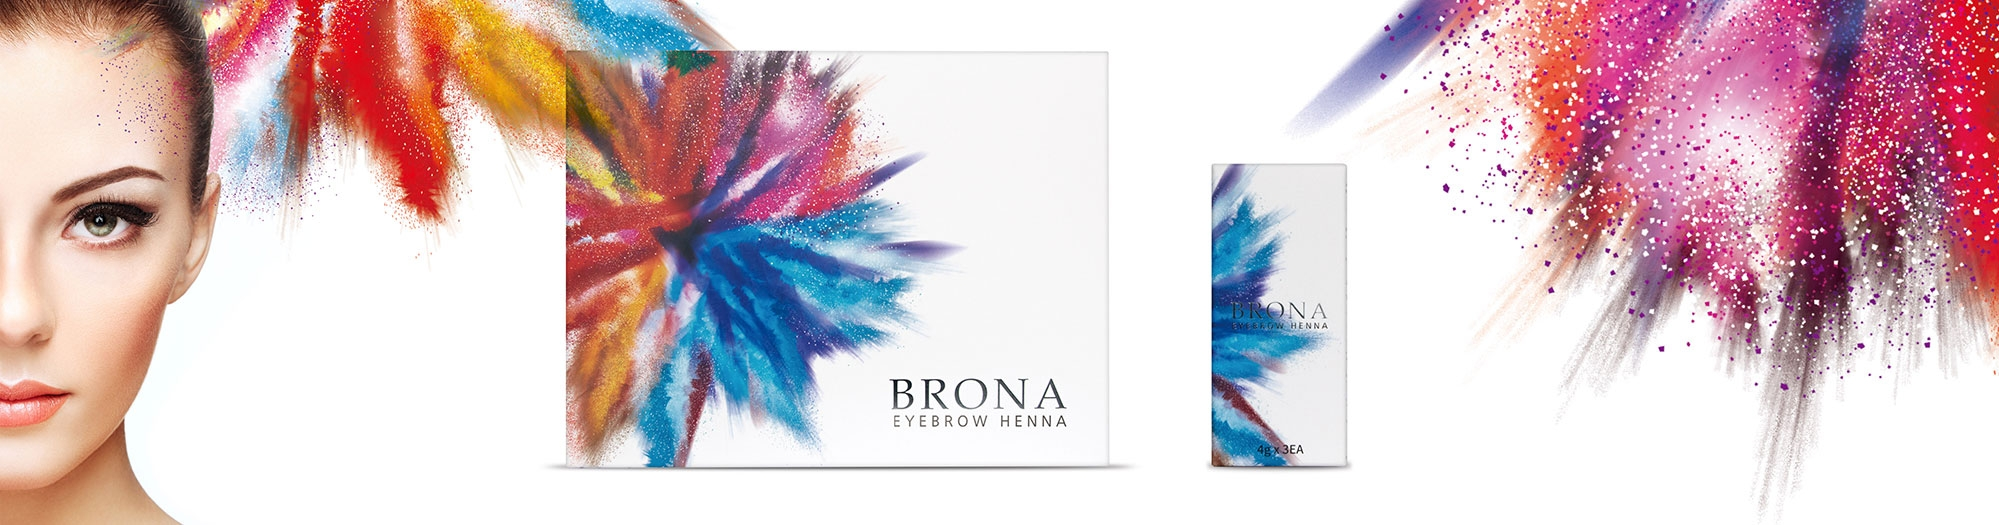 Henna Brona